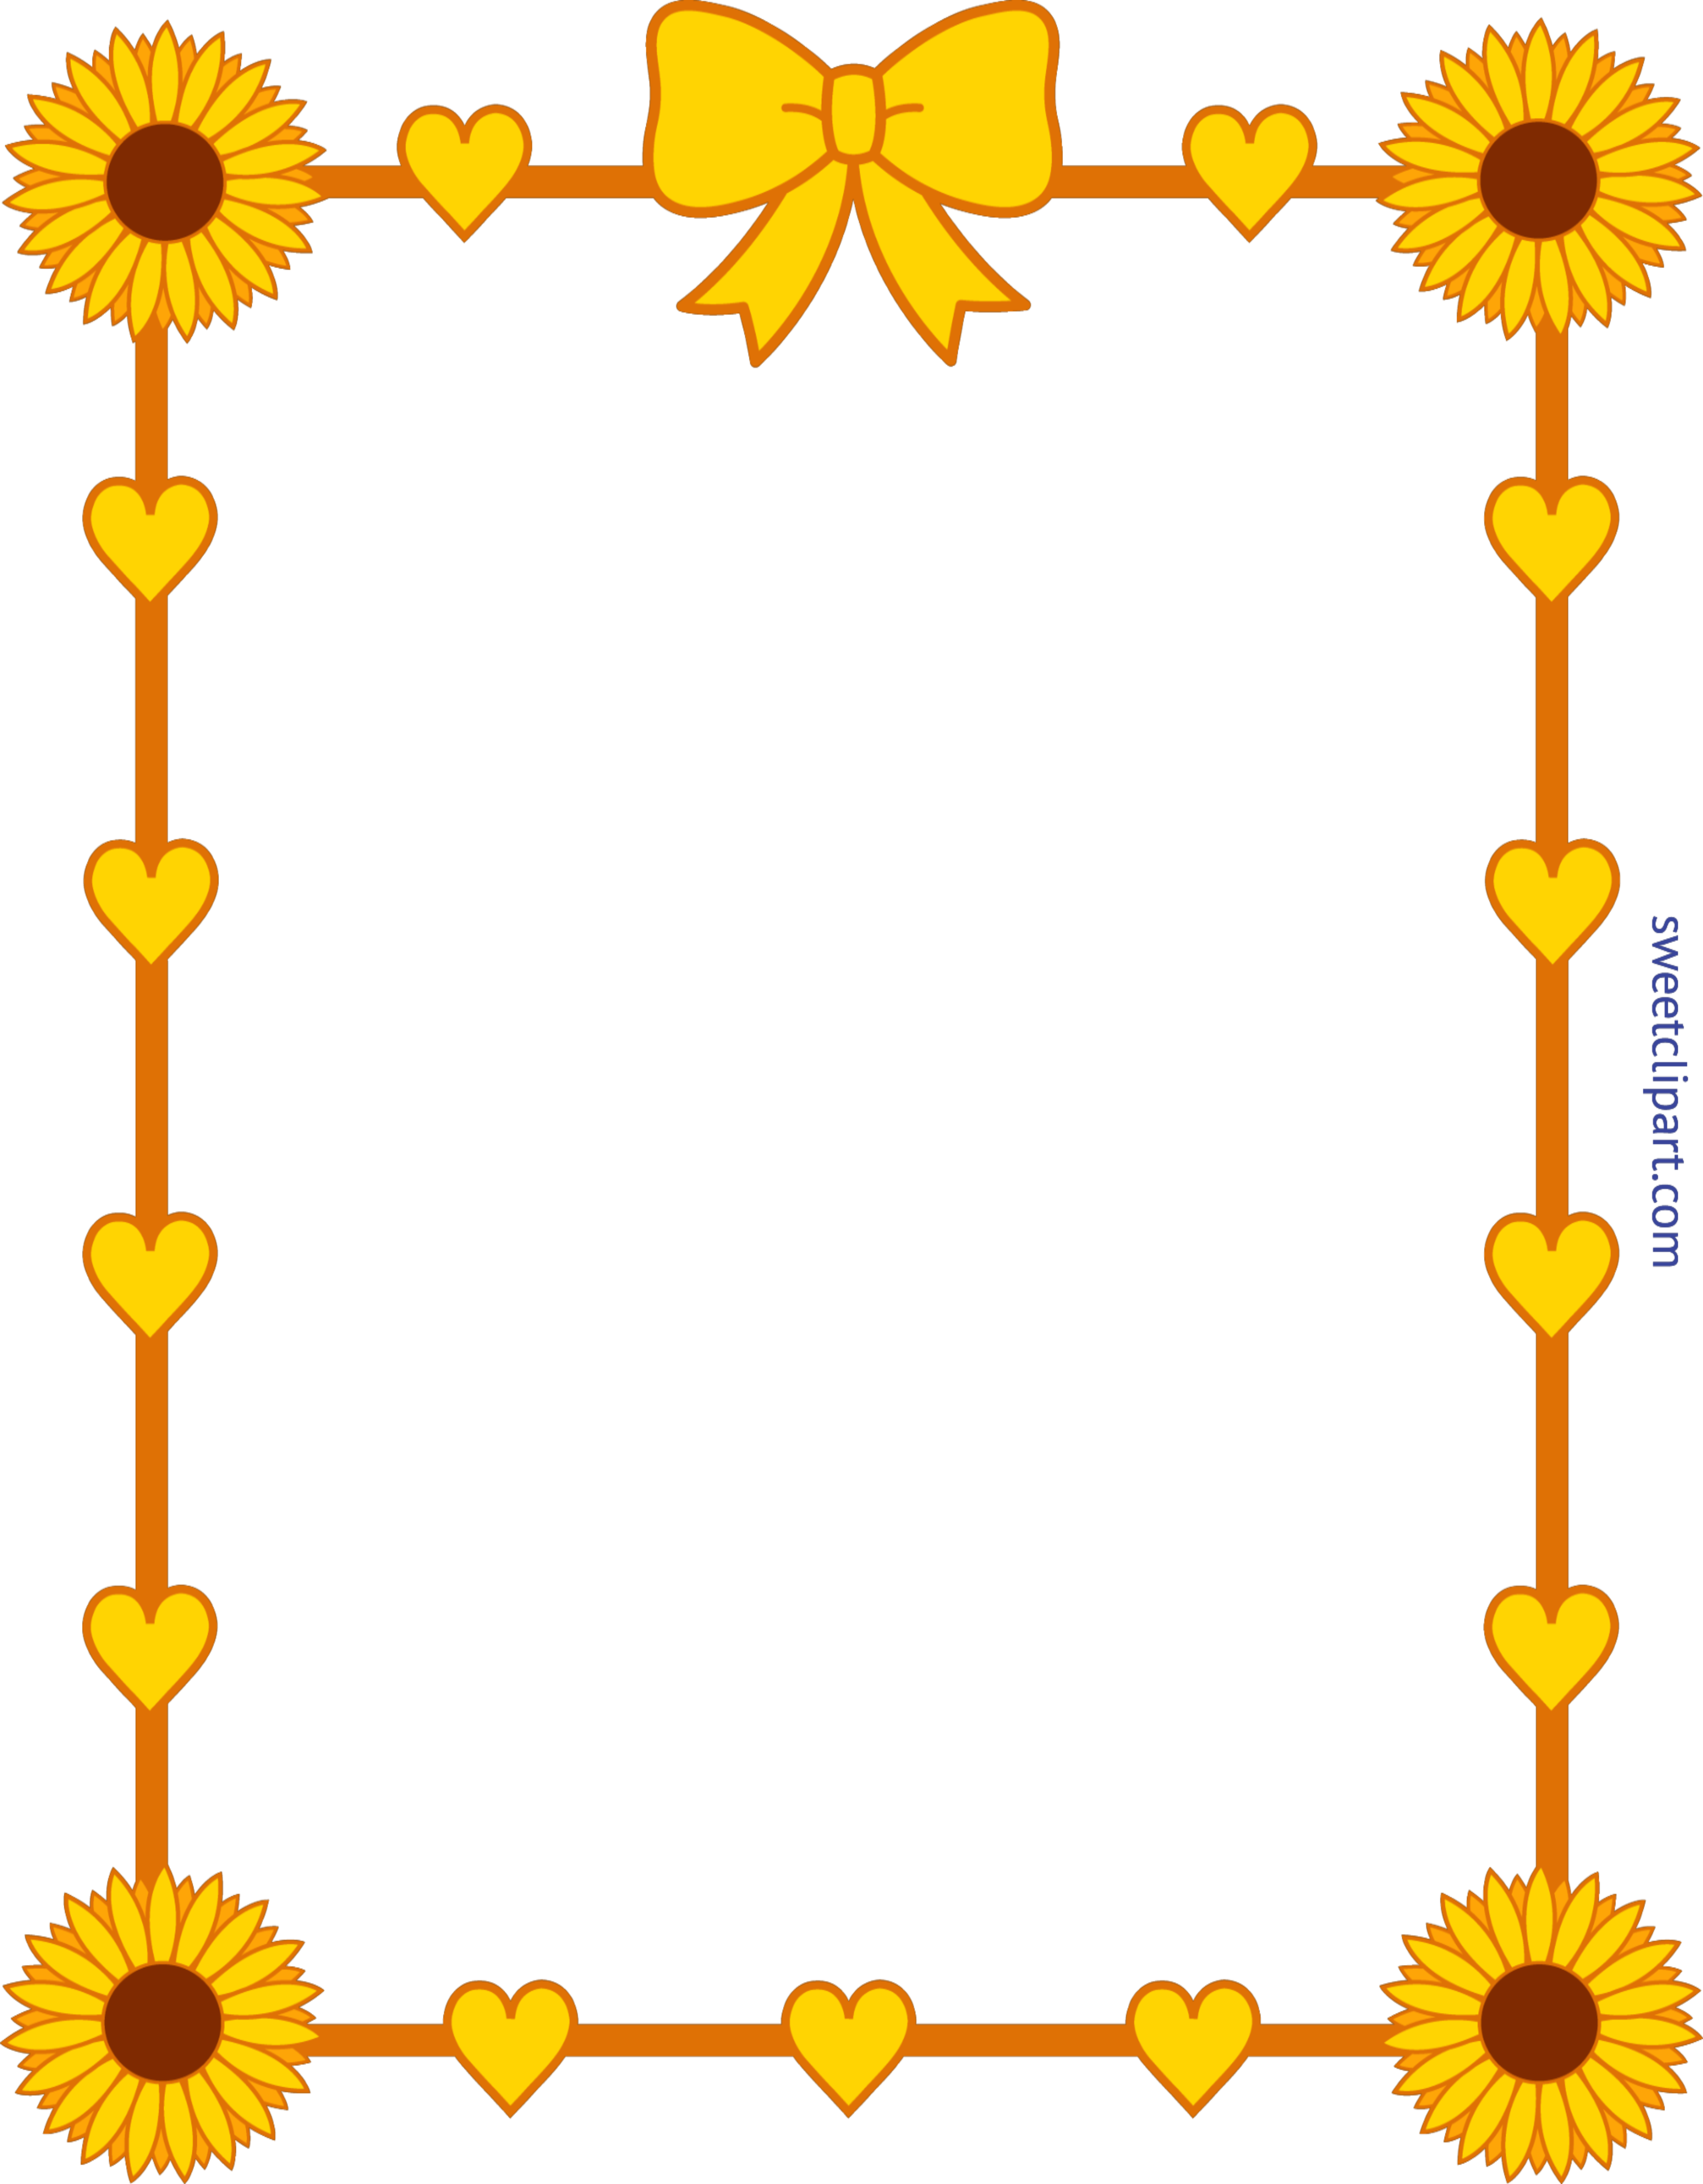 Sunflower Yellow Hearts Frame Border Clip Art.